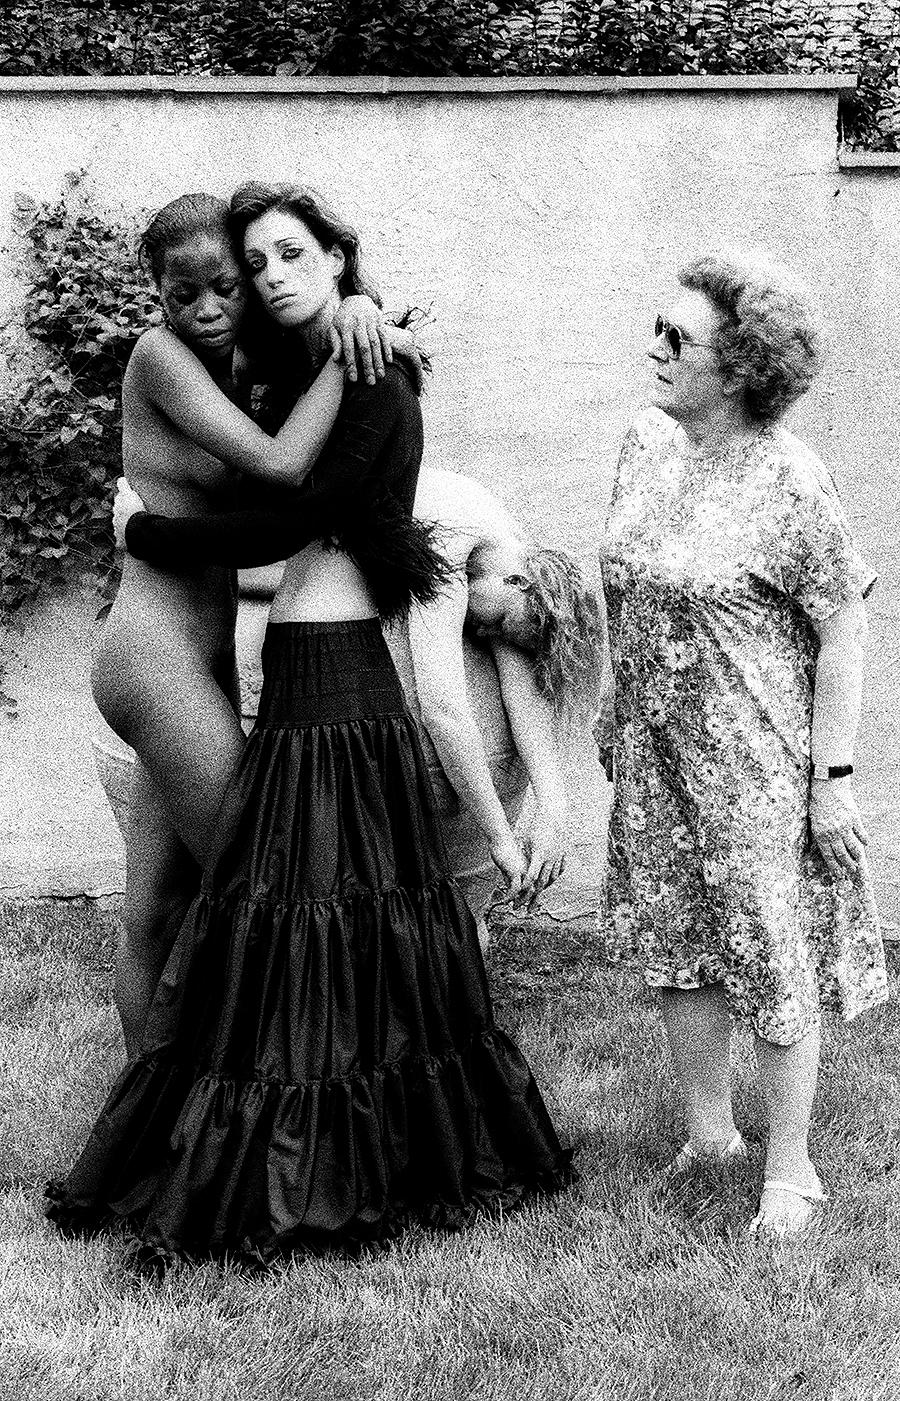 tony_ward_studio_tableaux_vivants_crime_scene_fashion_black_white_lesbians